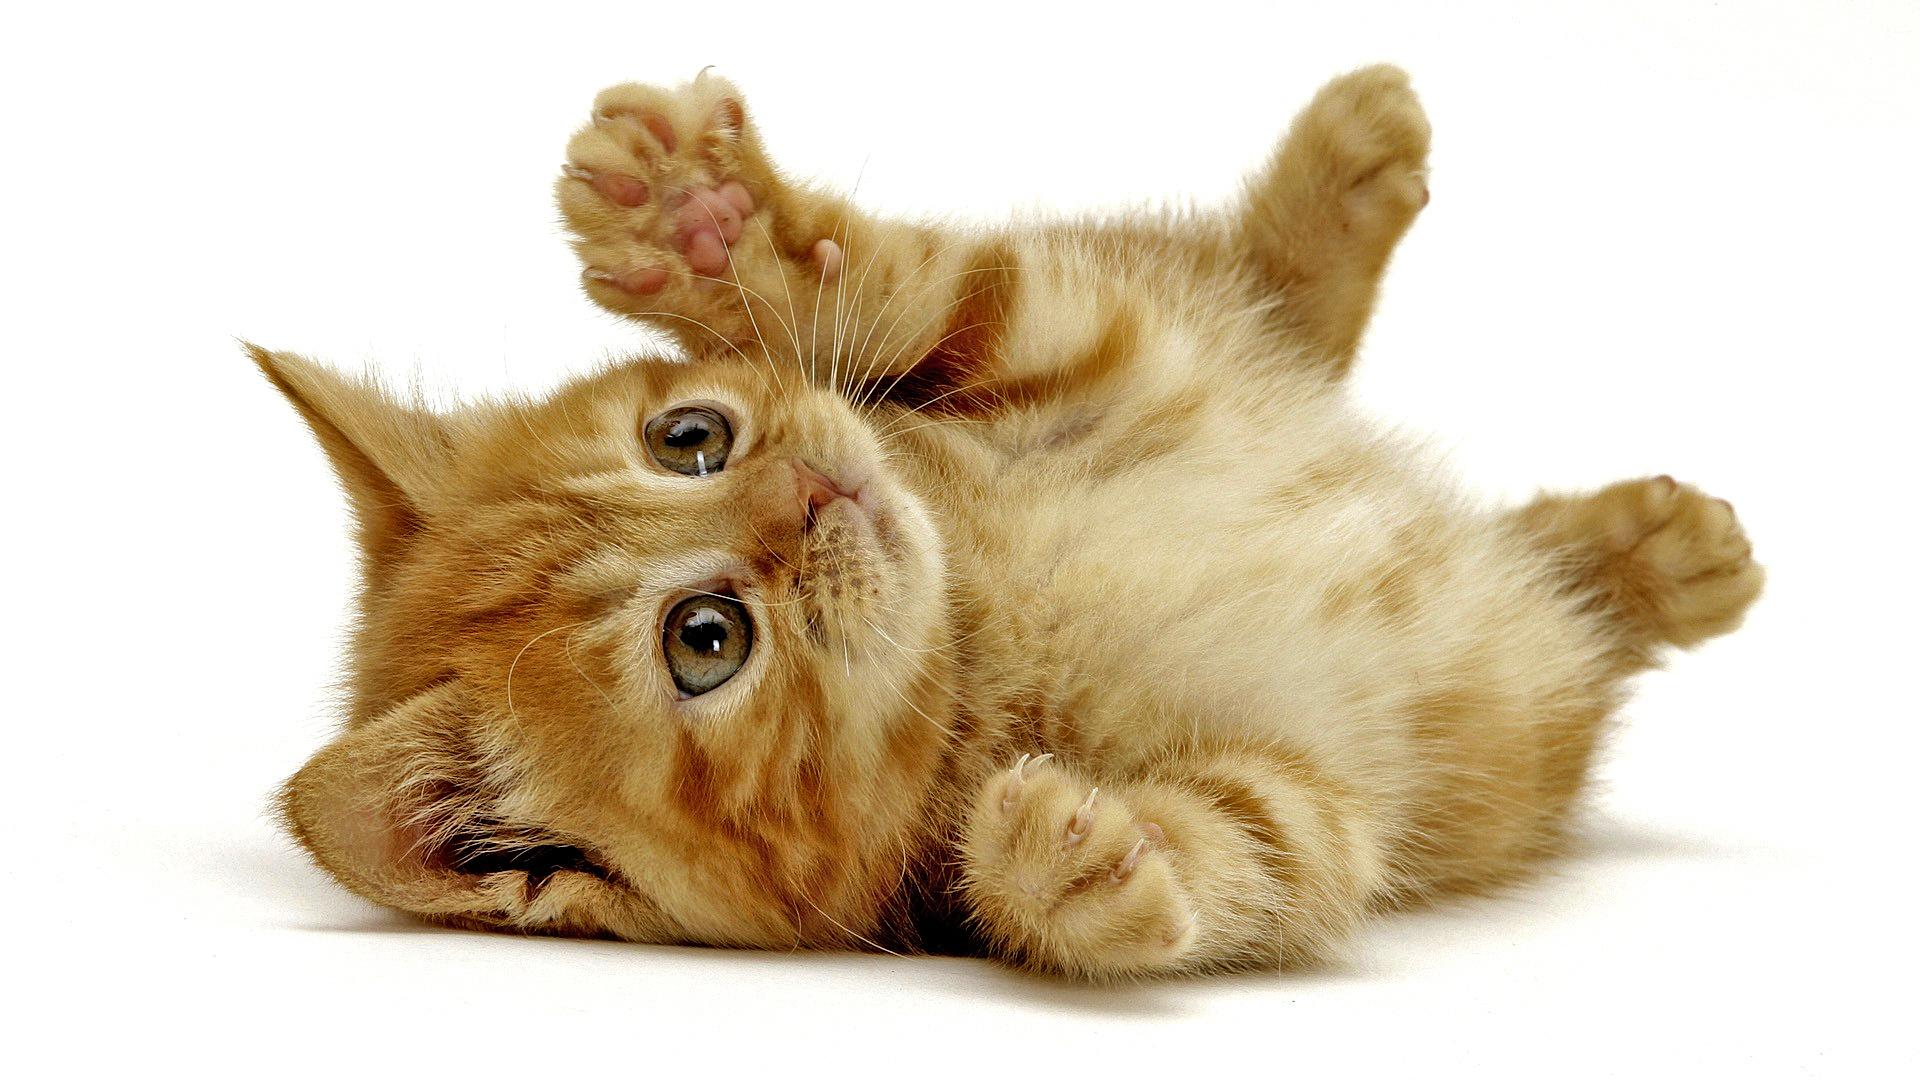 Cartoon Cat Images Stock Photos amp Vectors  Shutterstock